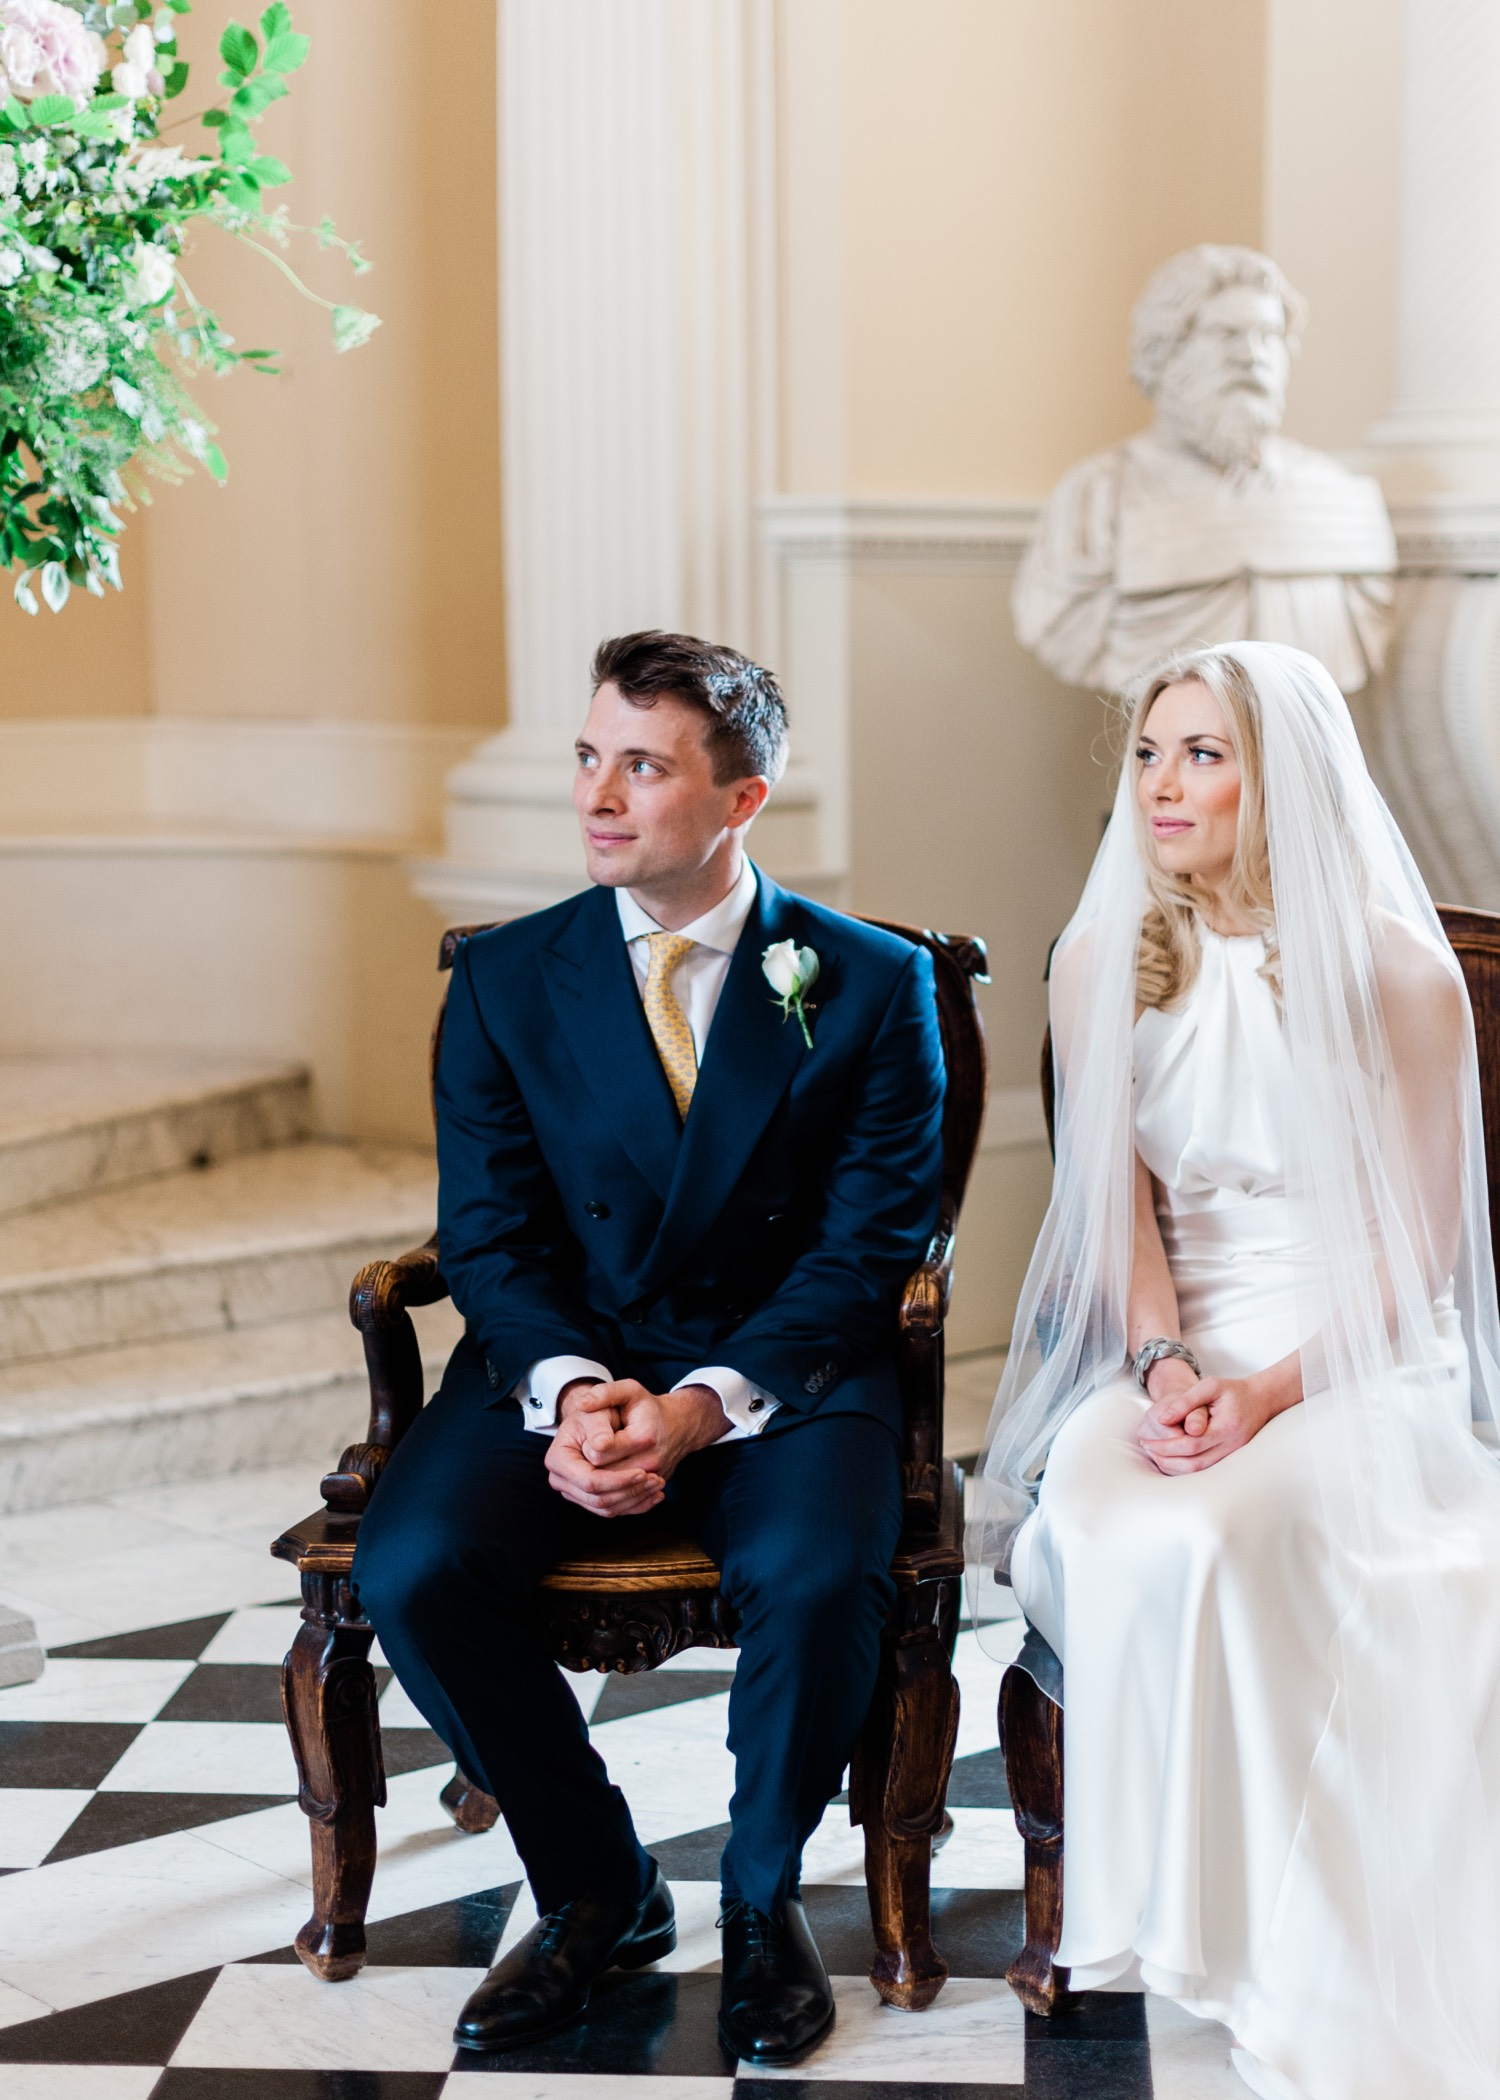 Littleton-Rose-Syon-House-London-Wedding-Planner-Wedding-Ceremony.jpg